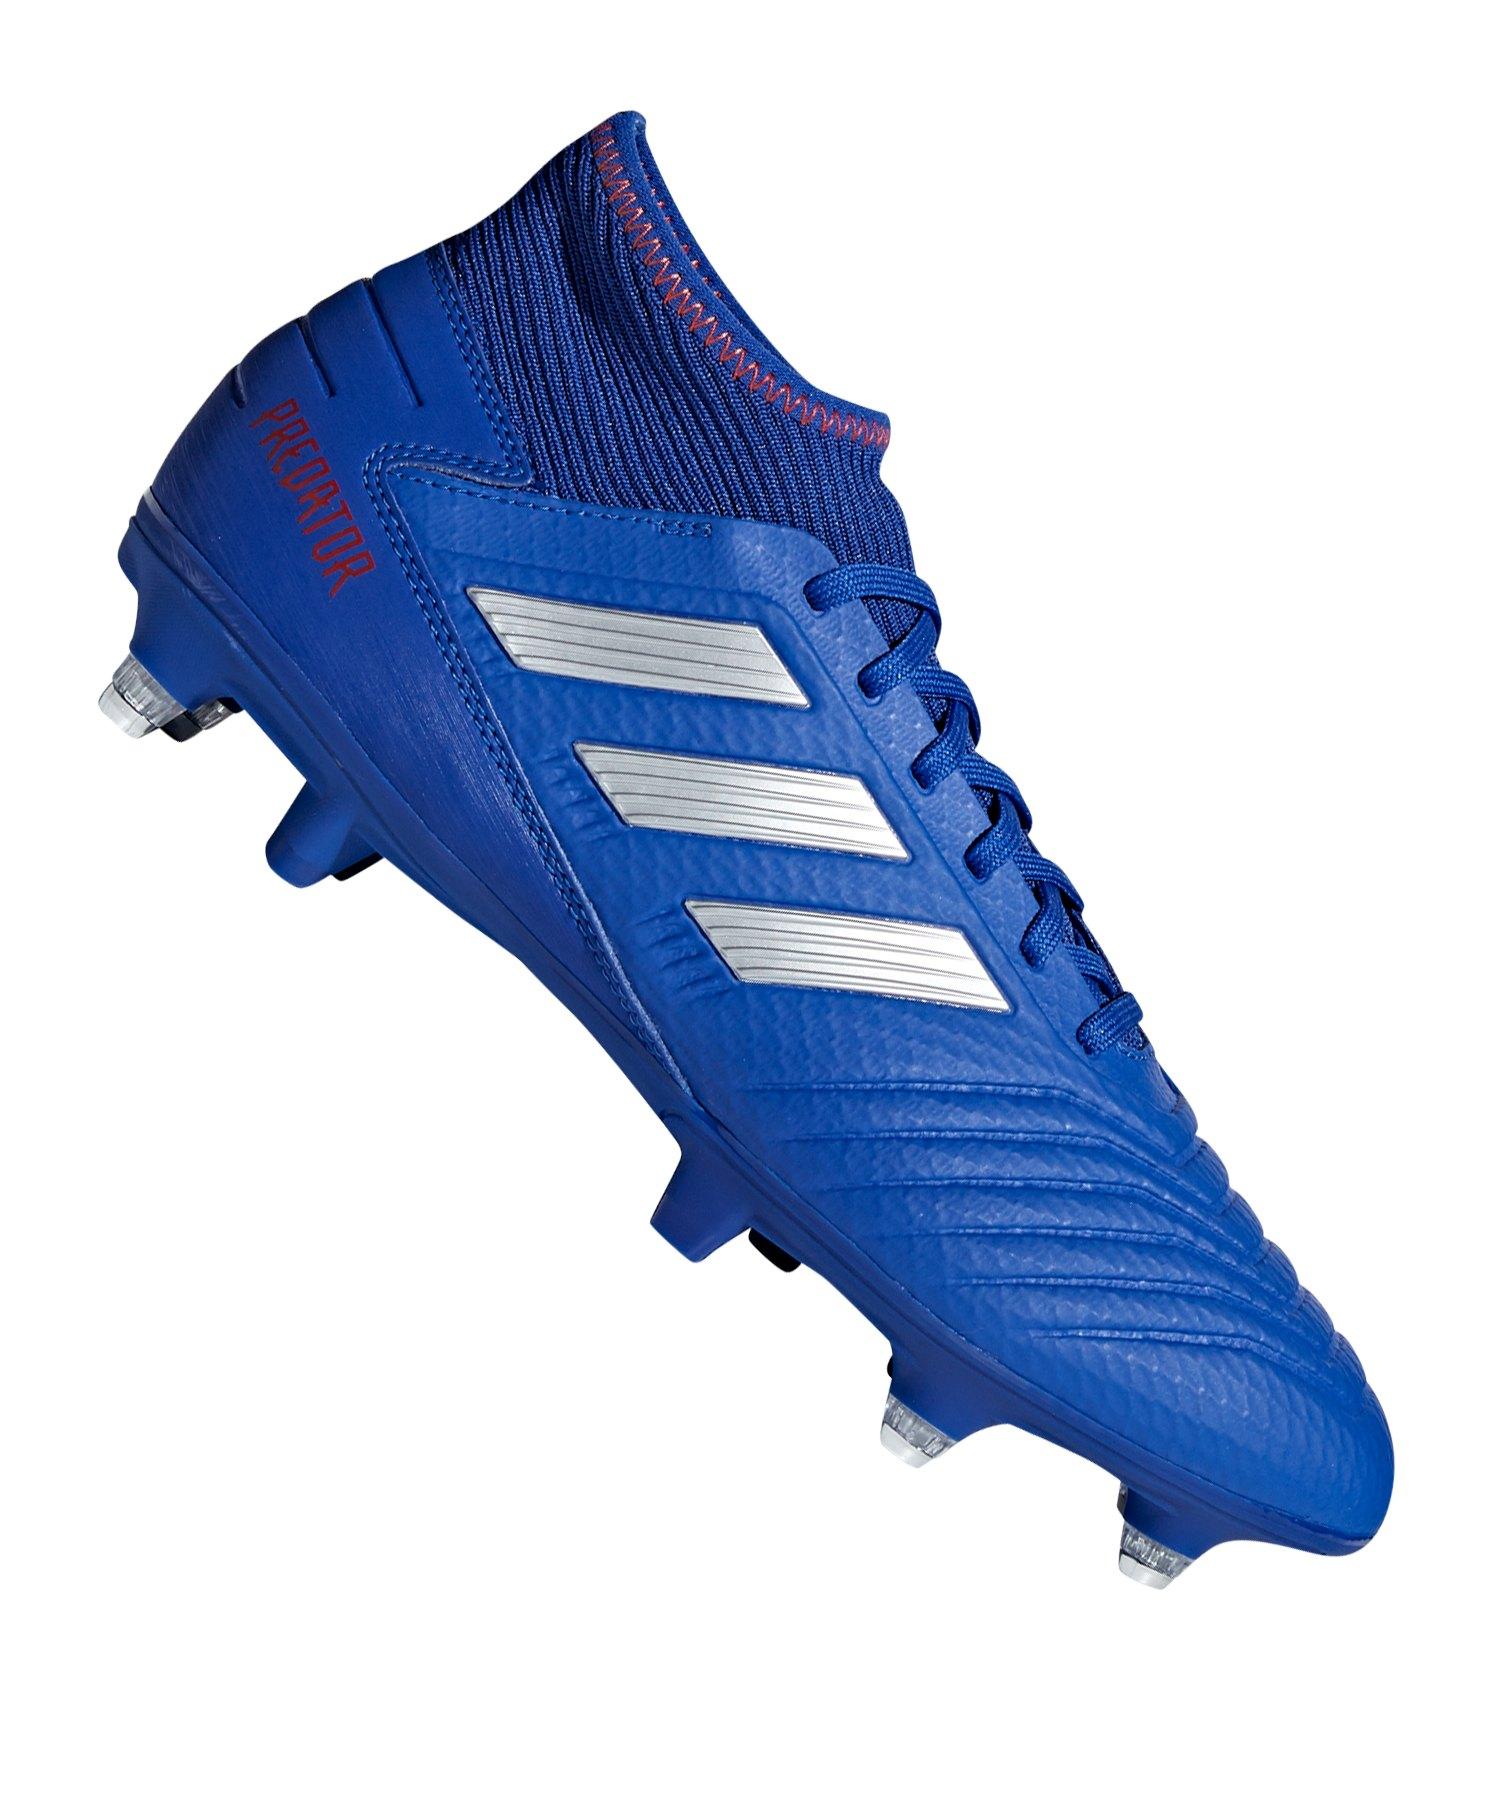 adidas Predator 19.3 SG Blau Silber